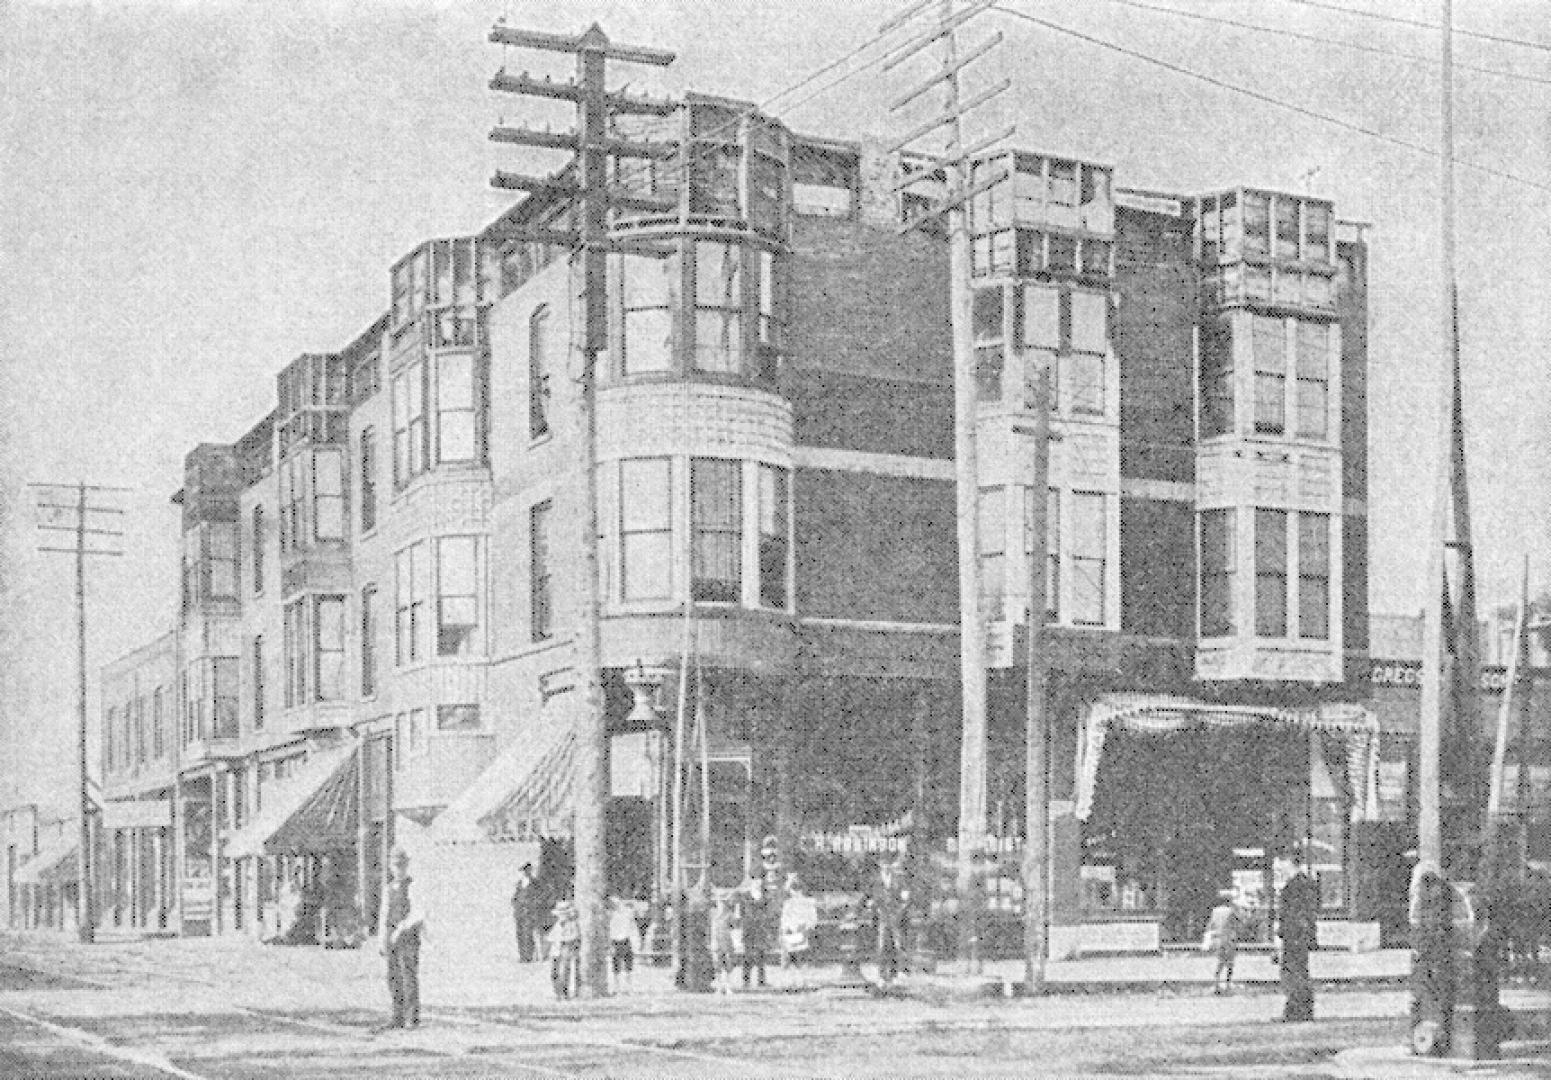 H. H. Holmes kastélya 1. kép